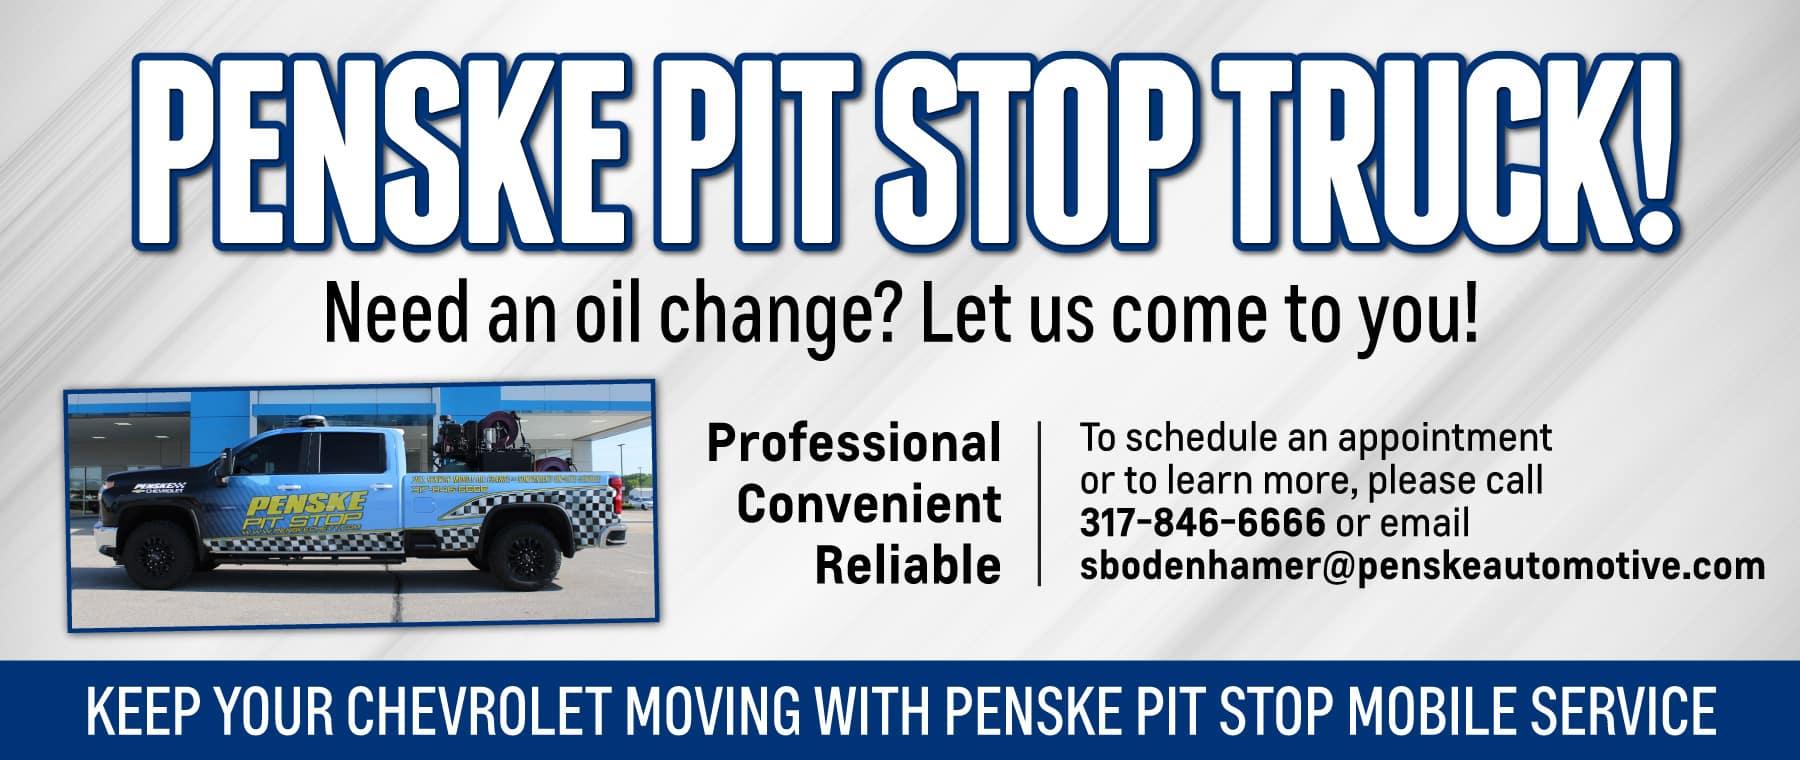 Penske Pit Stop Truck - Need an Oil Change? Let Us know!